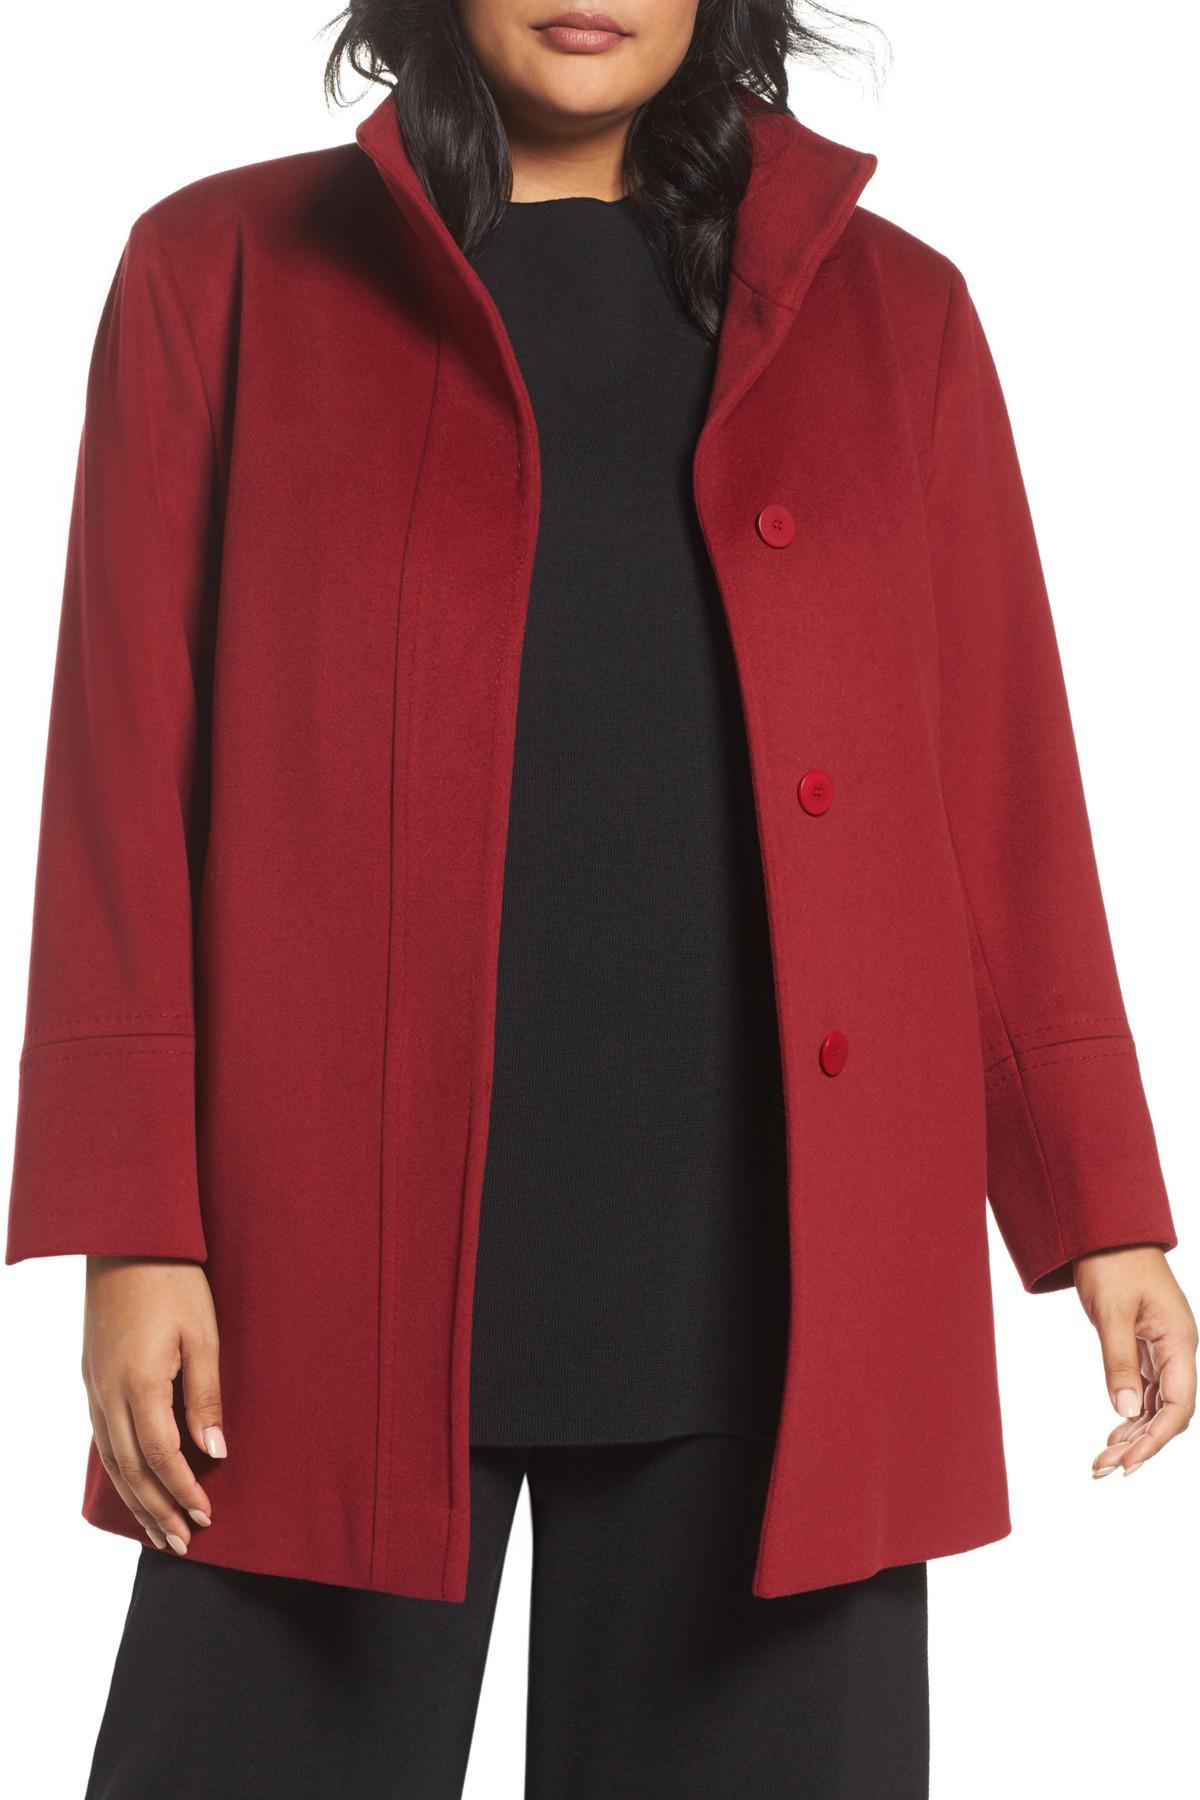 cd9084e7872e8 Lyst - Fleurette Wool Car Coat (plus Size) (nordstrom Exclusive) in Red